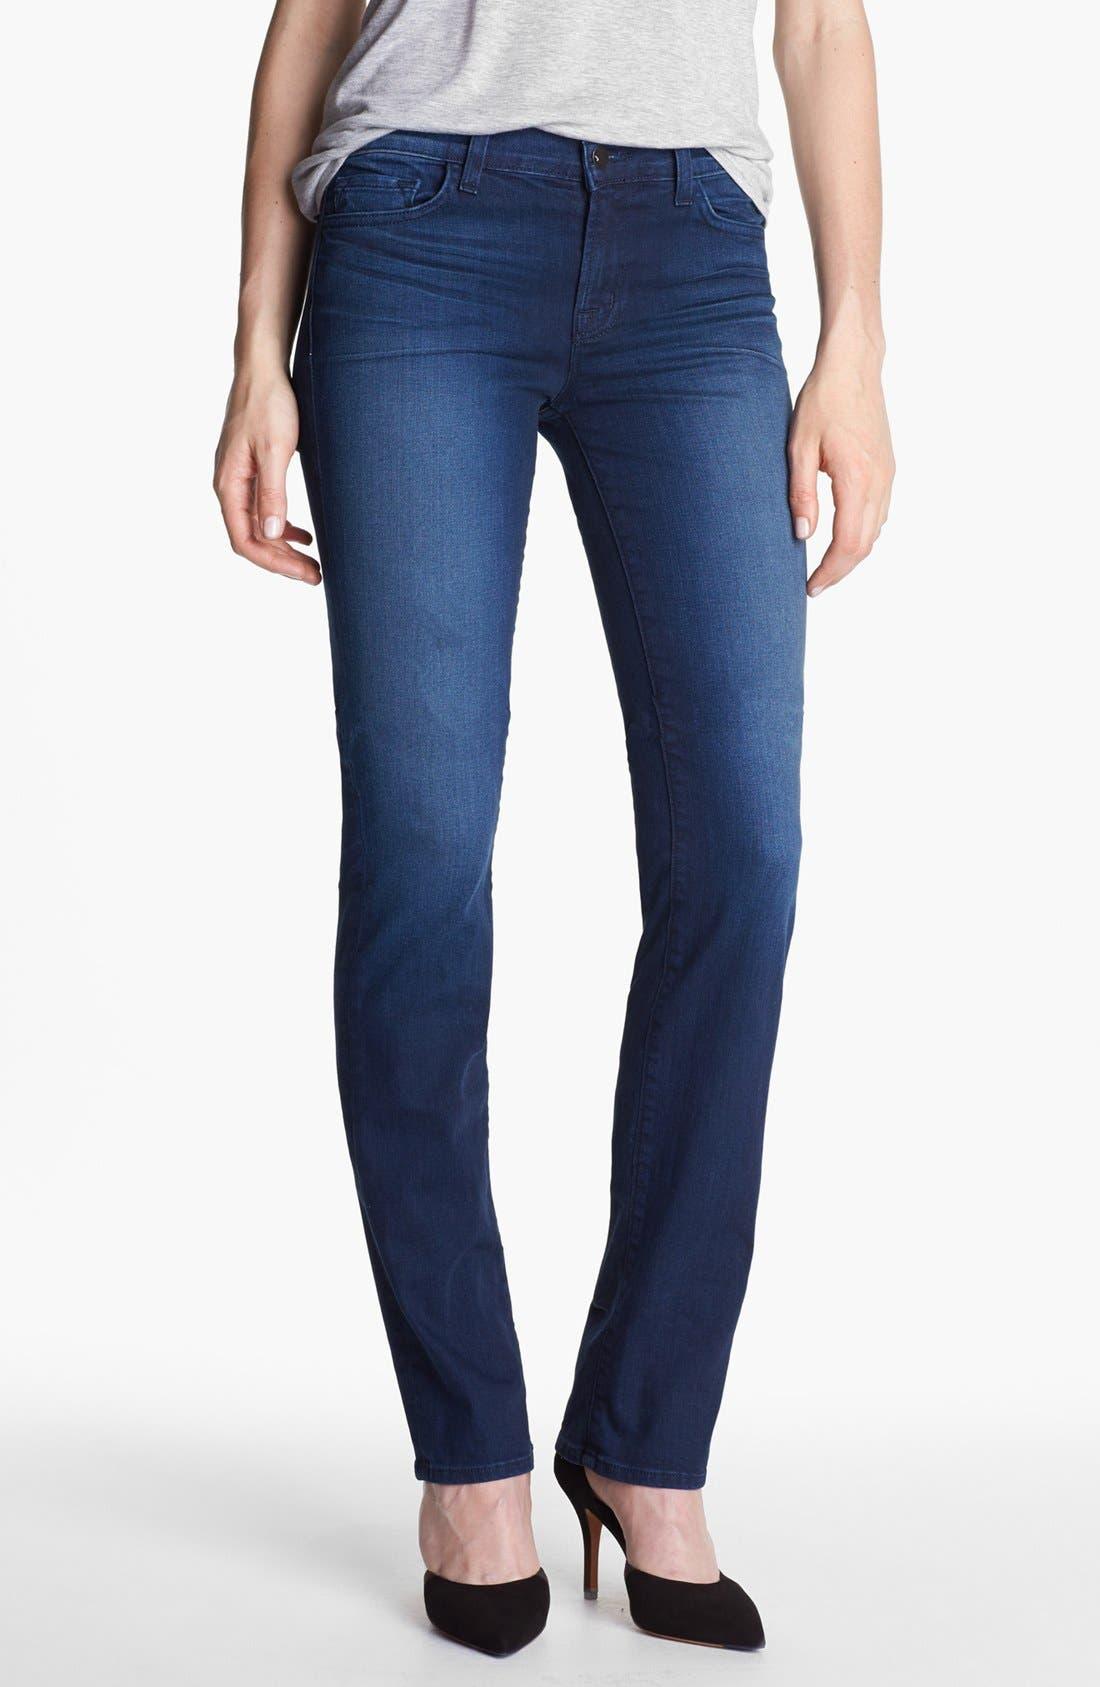 Alternate Image 1 Selected - J Brand '814' Mid-Rise Cigarette Leg Jeans (Avalon)